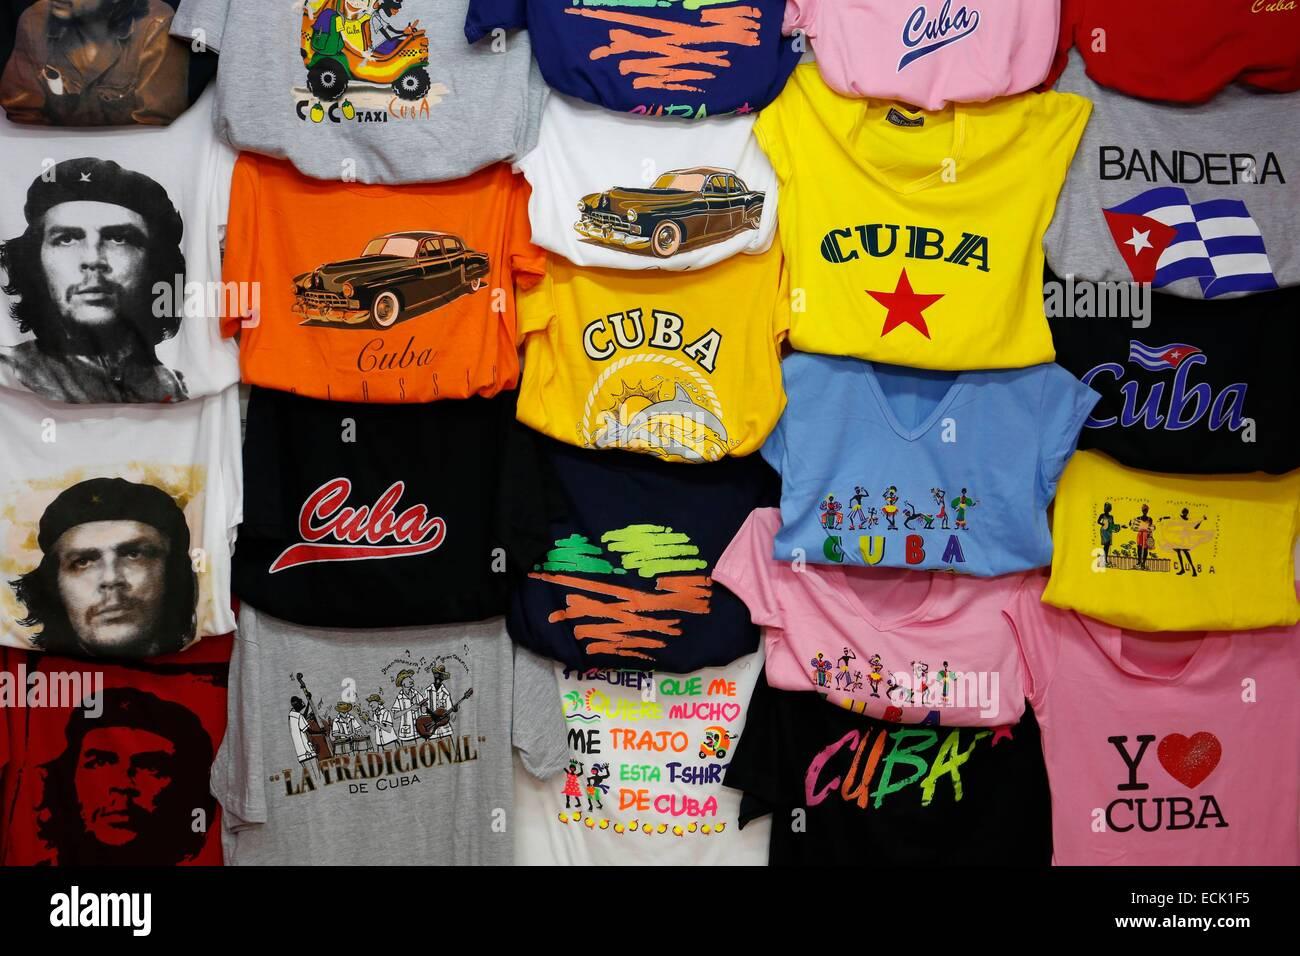 Cuba, La Havana, tee-shirts stall - Stock Image